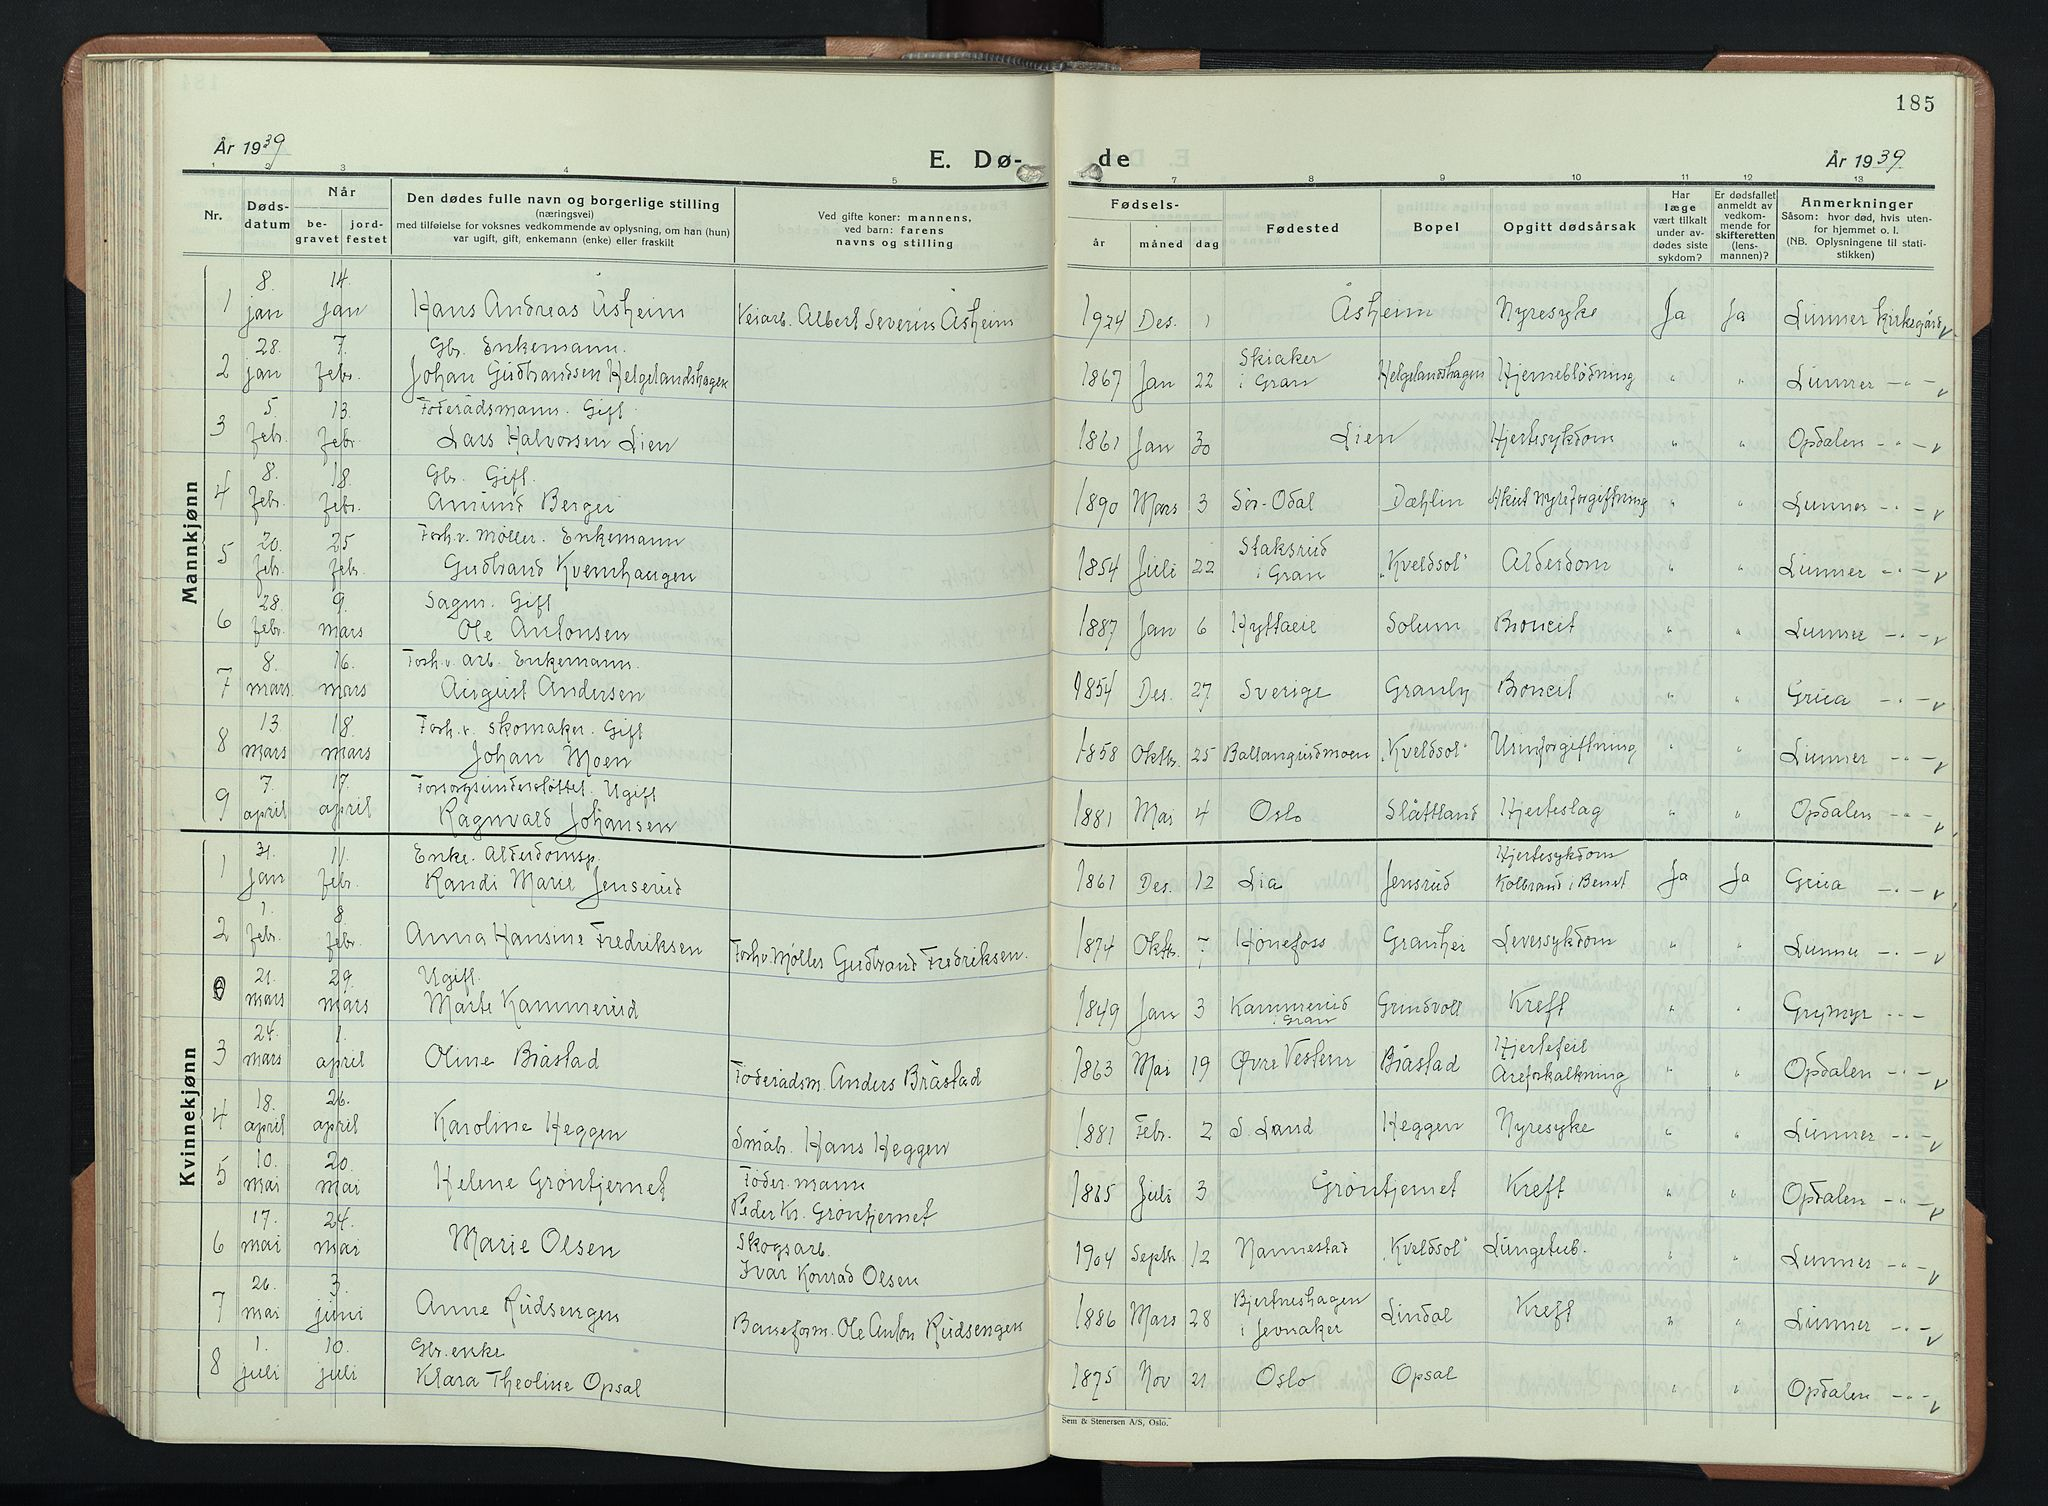 SAH, Lunner prestekontor, H/Ha/Hab/L0003: Klokkerbok nr. 3, 1933-1945, s. 185